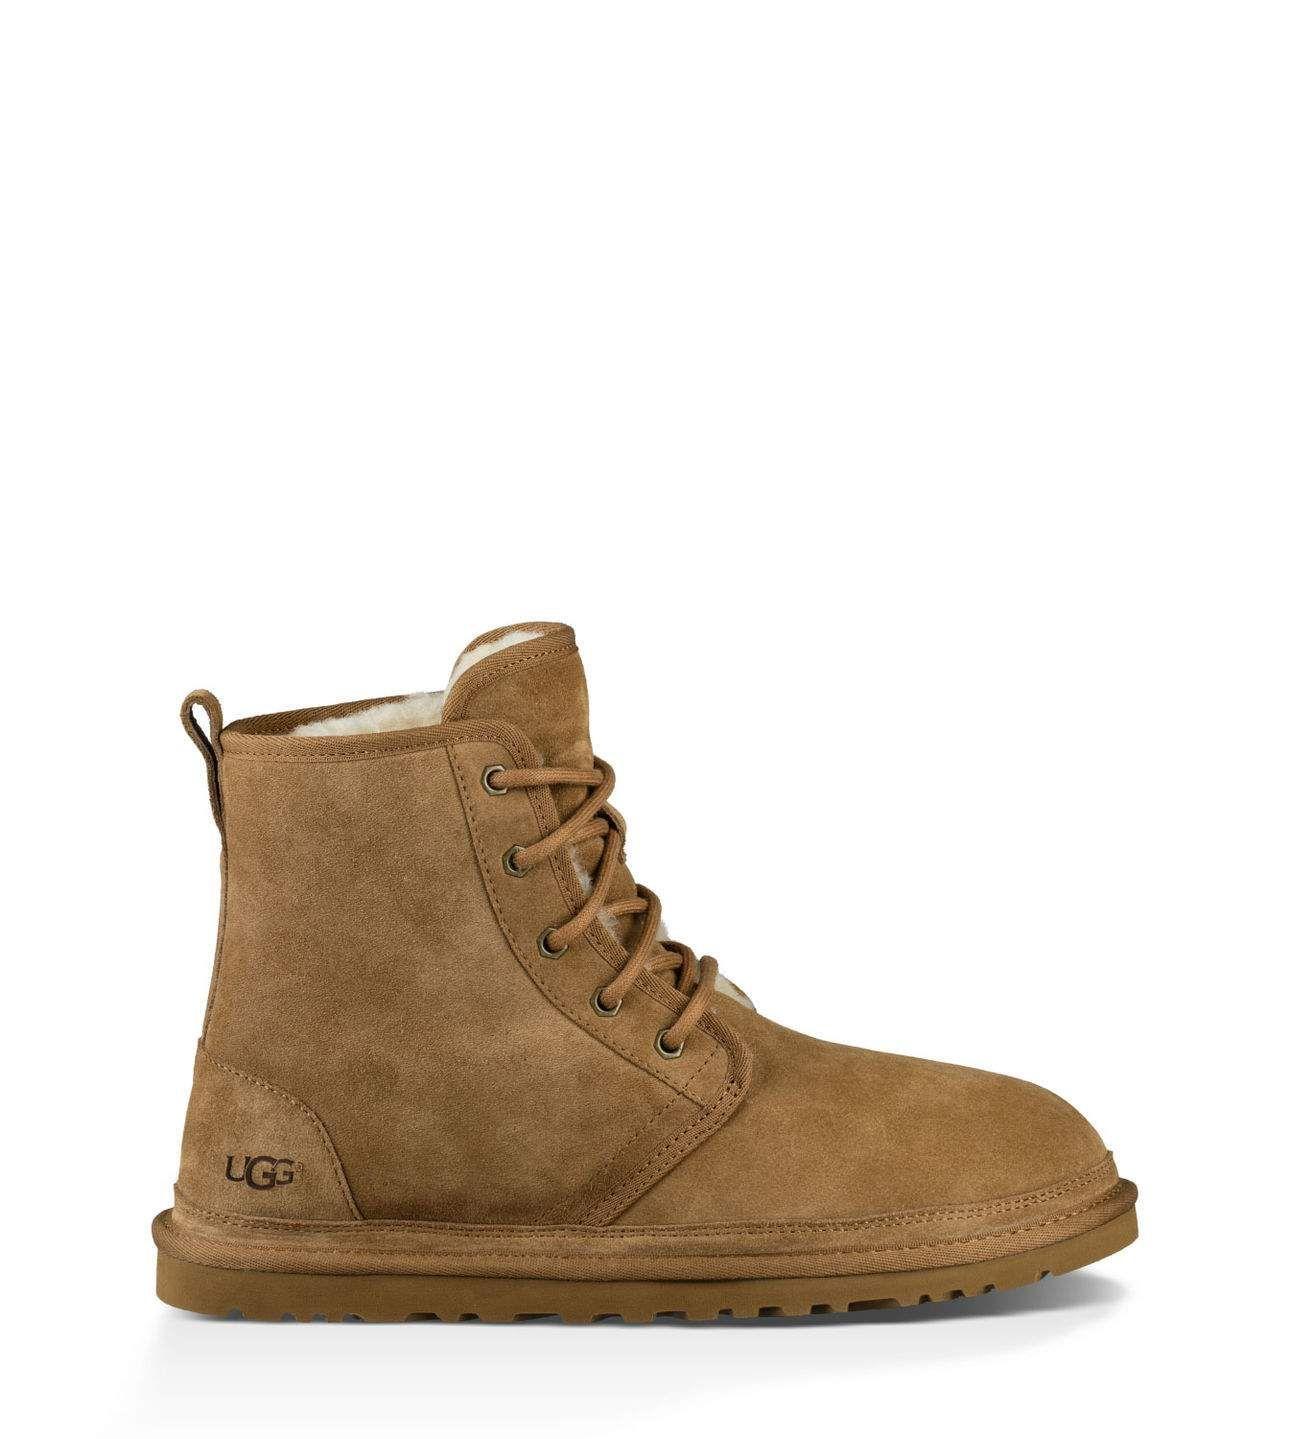 8ab80e8562d Men's Share this product Harkley Boot | OOTD Inspo | Ugg winter ...